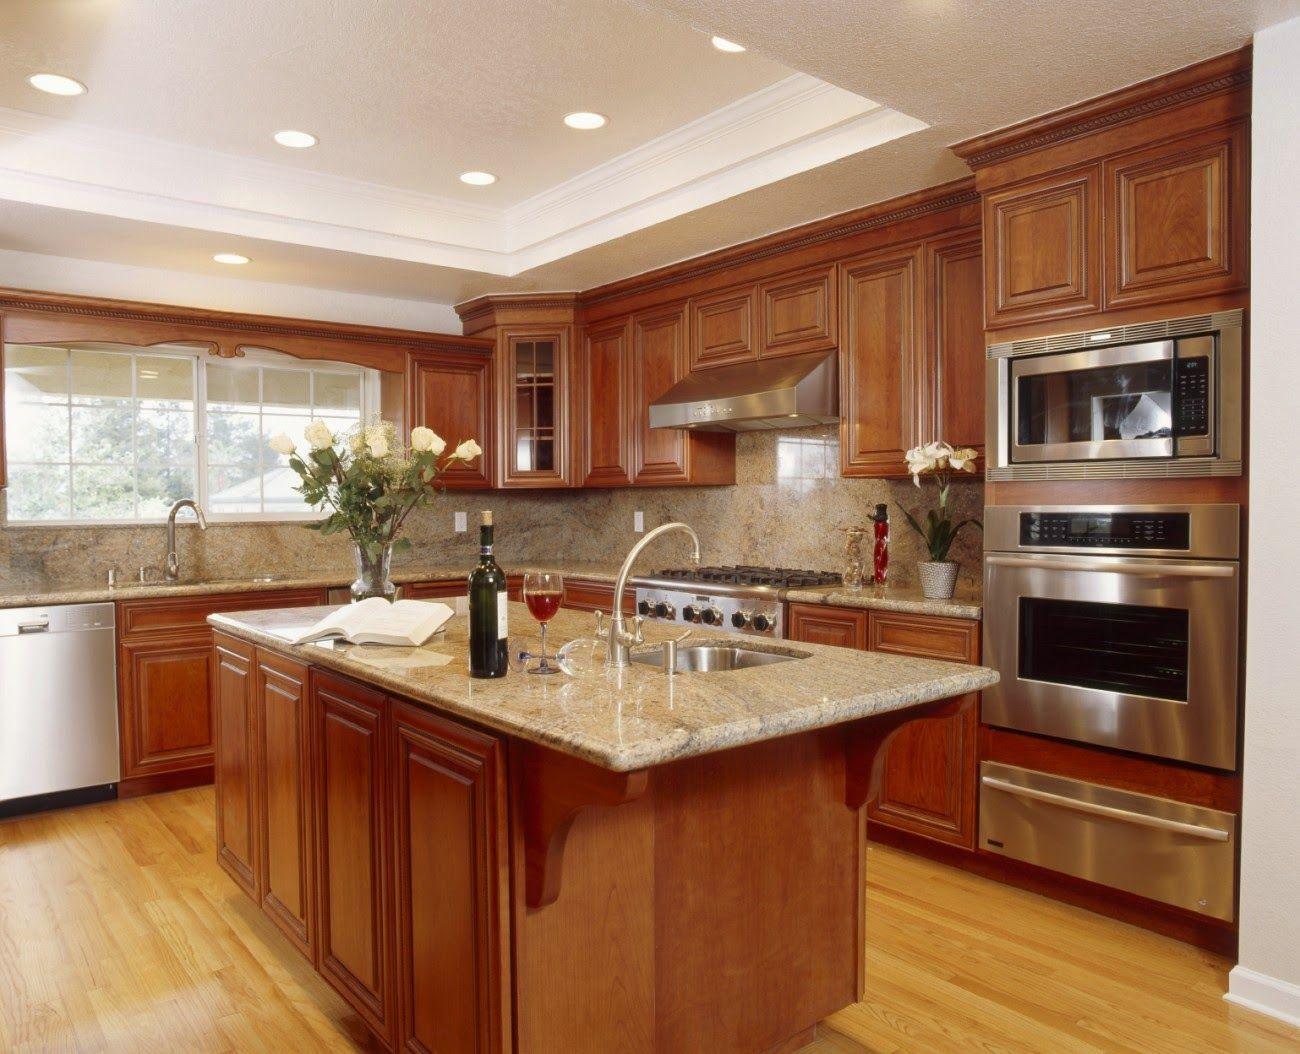 Discounted Kitchen Cabinetskitchen Cabinet Kings At Www Enchanting Standard Kitchen Design Inspiration